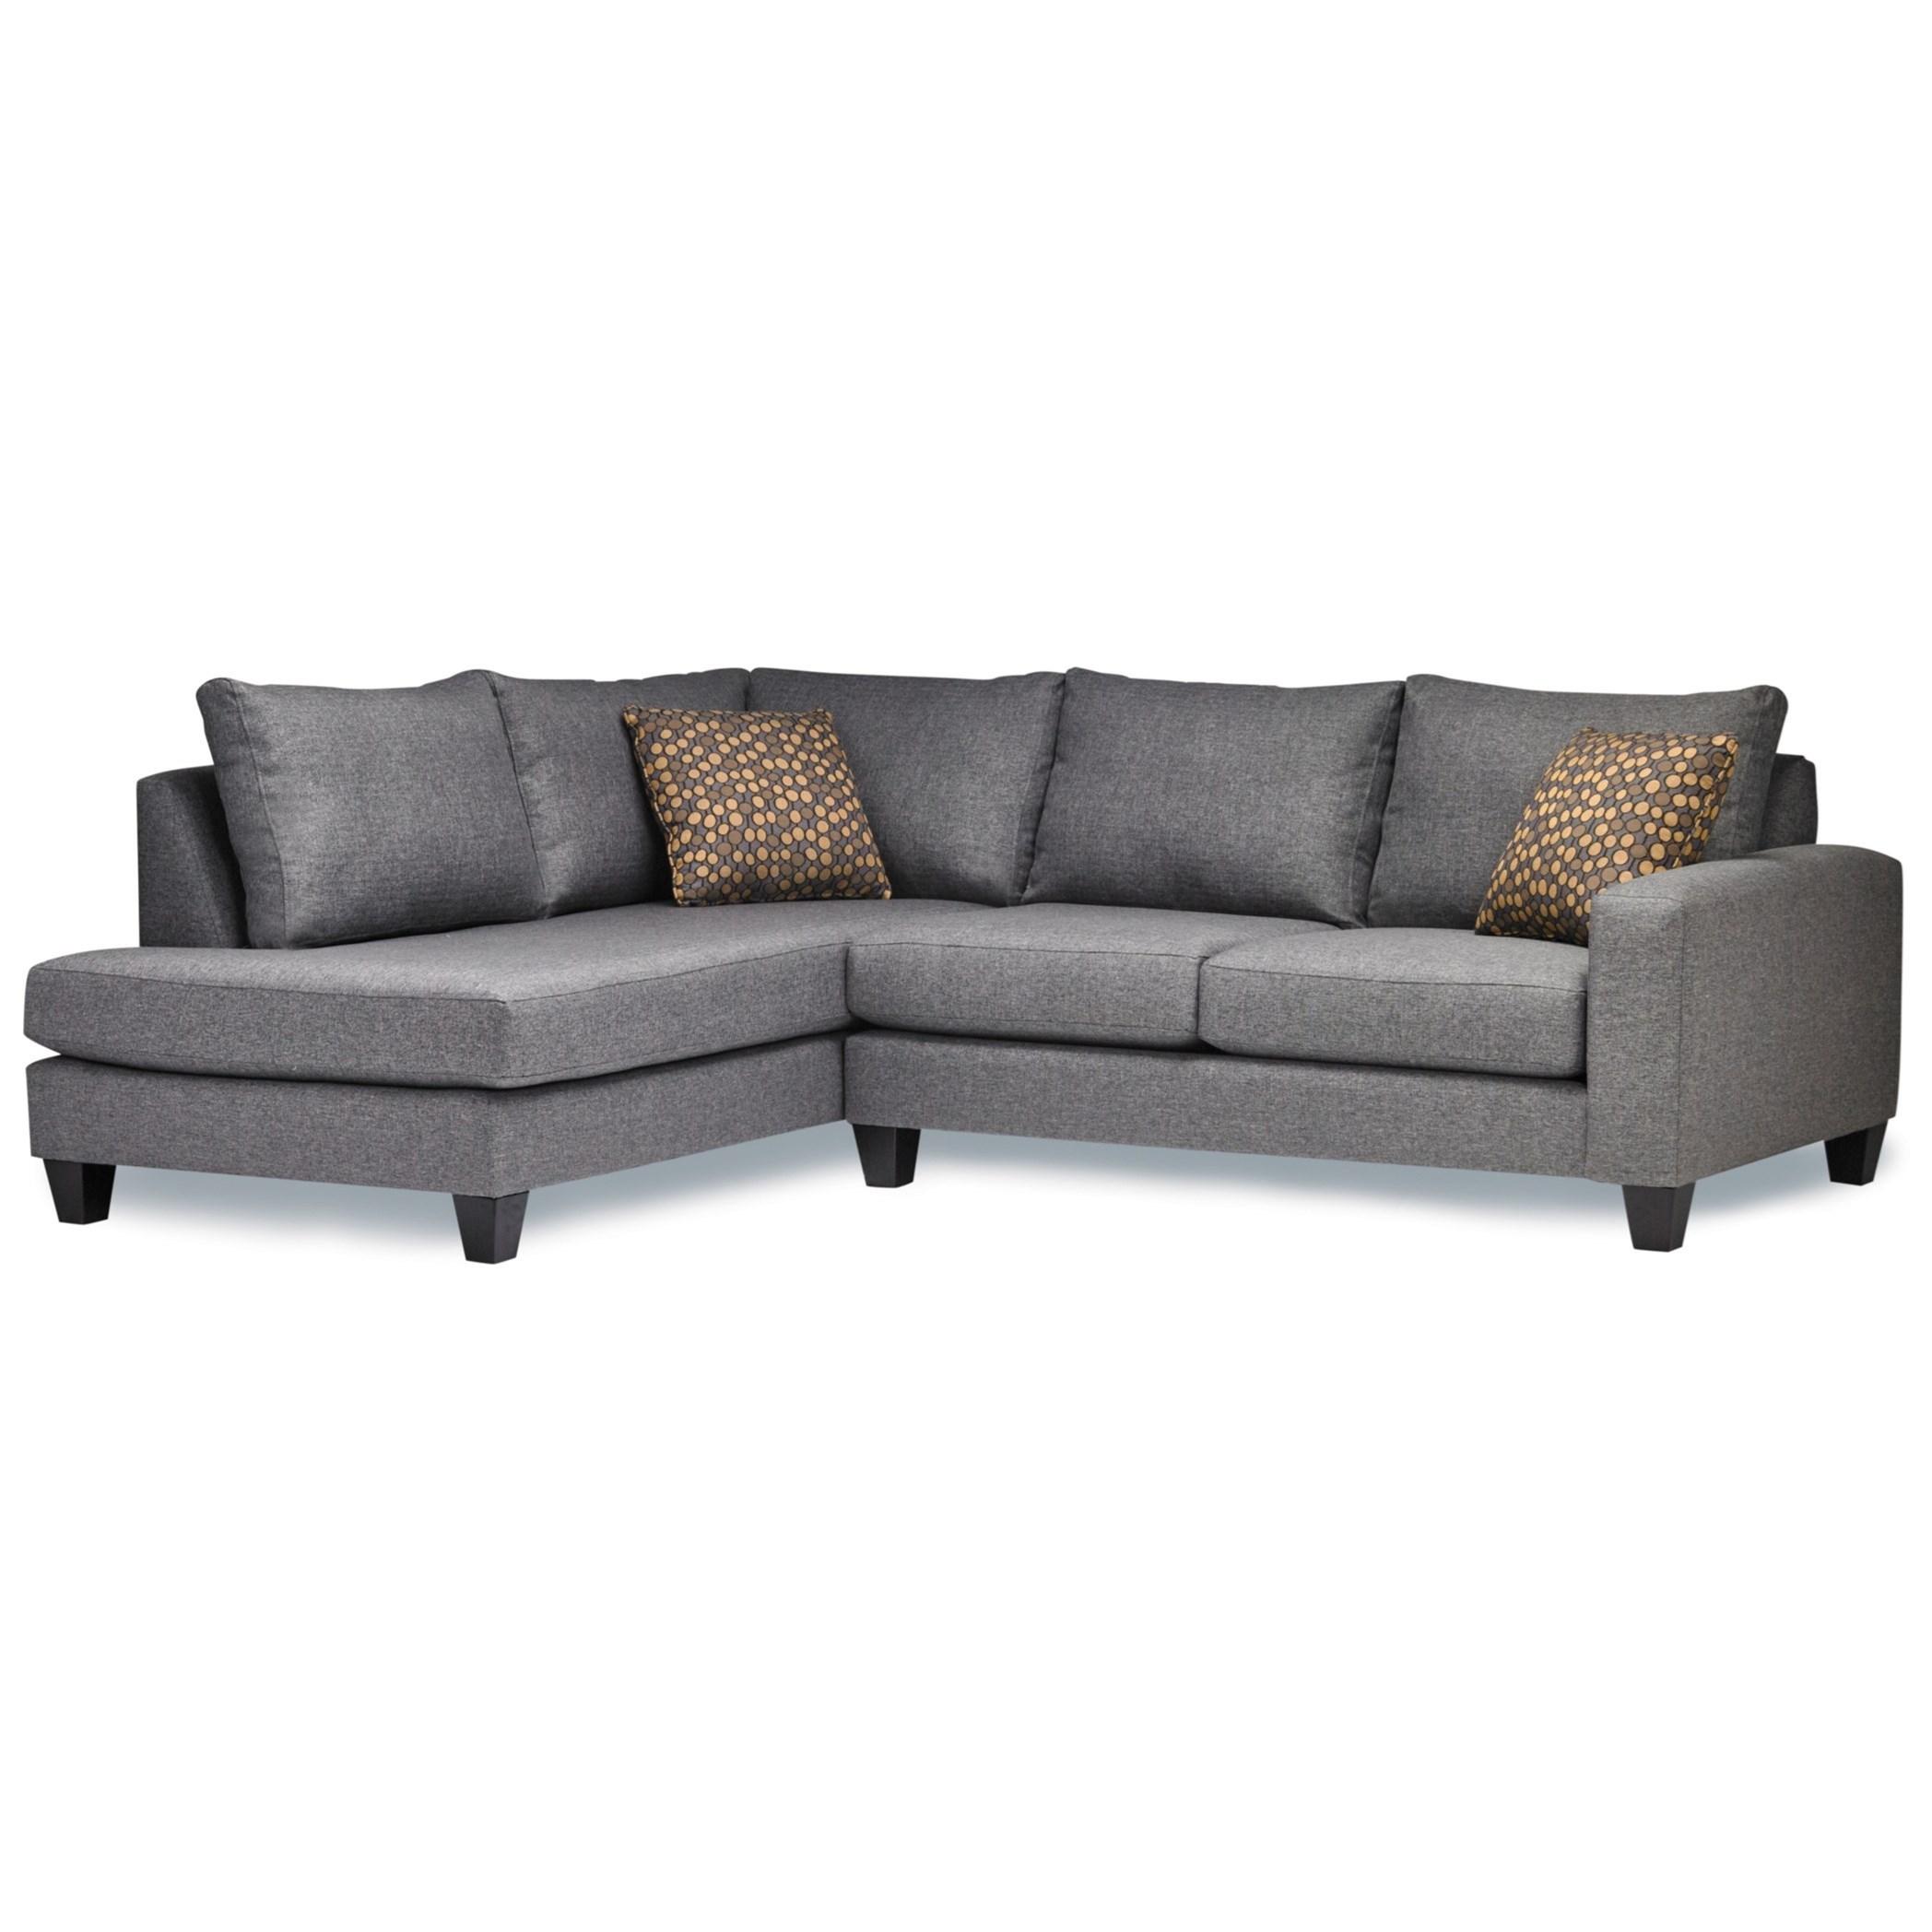 7711 2 Pc Sectional Sofa